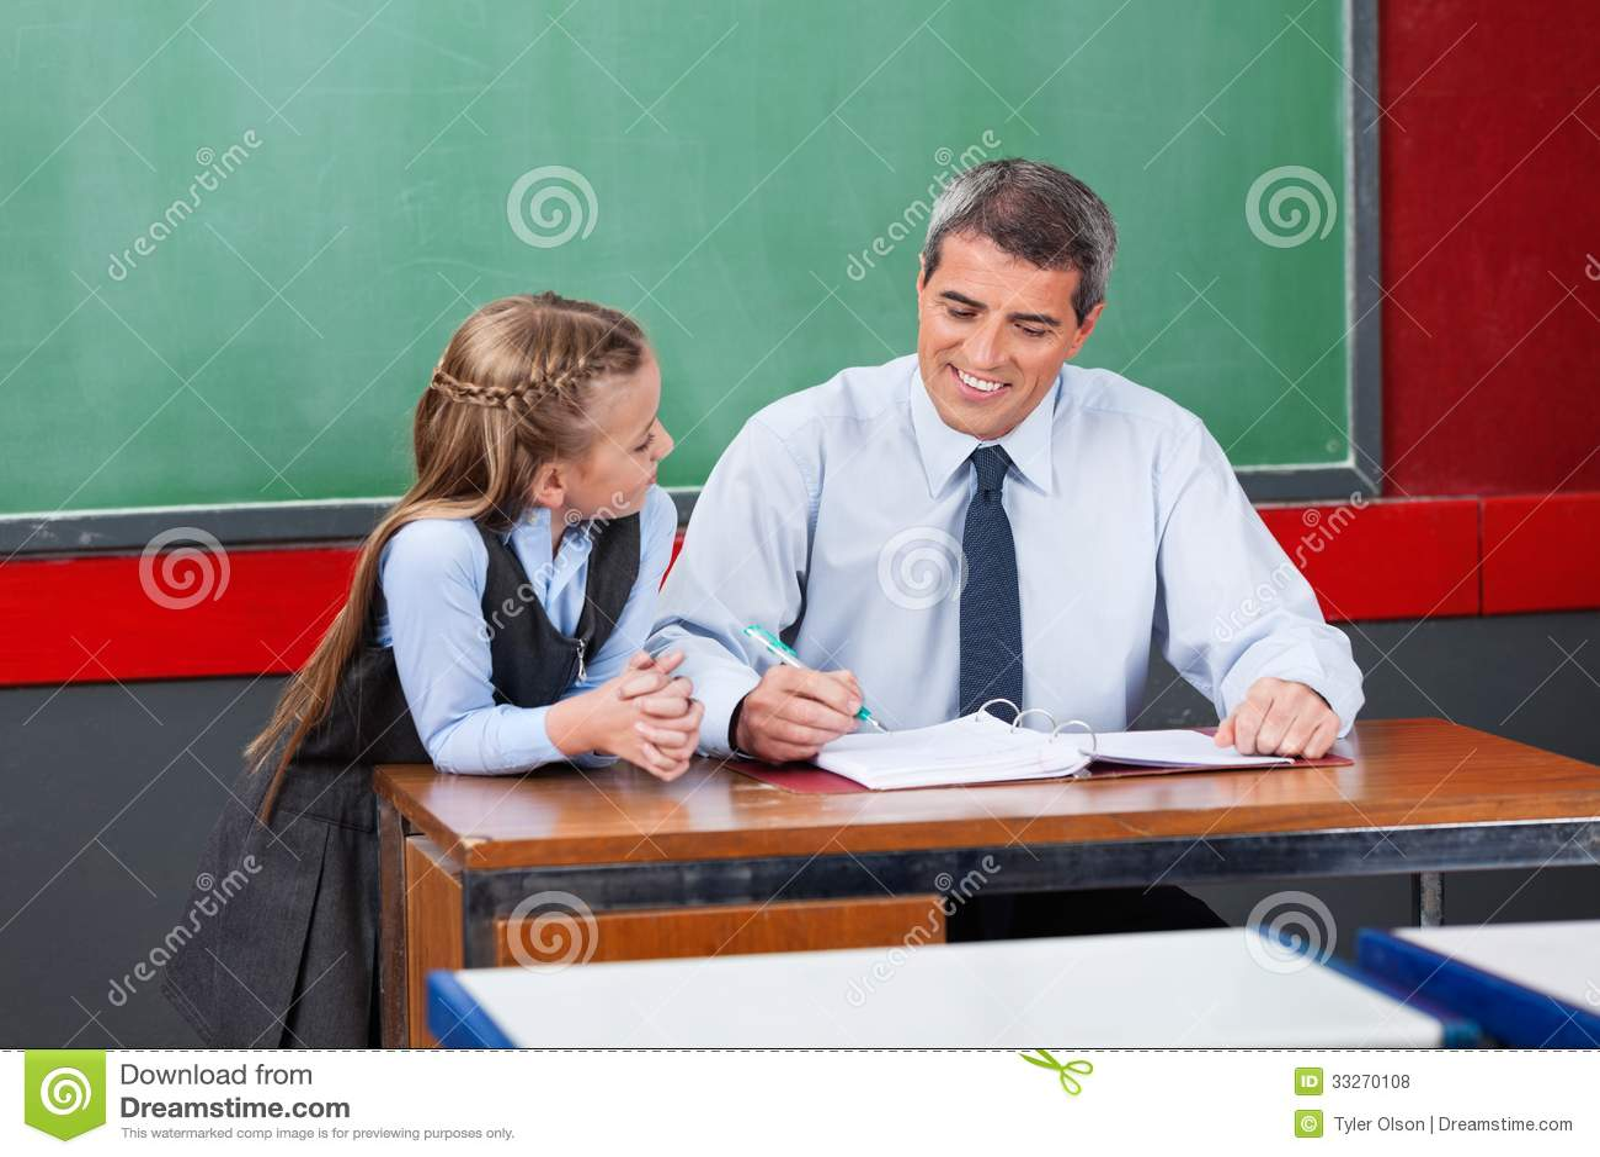 la profesora de ingles da una leccion de sexo